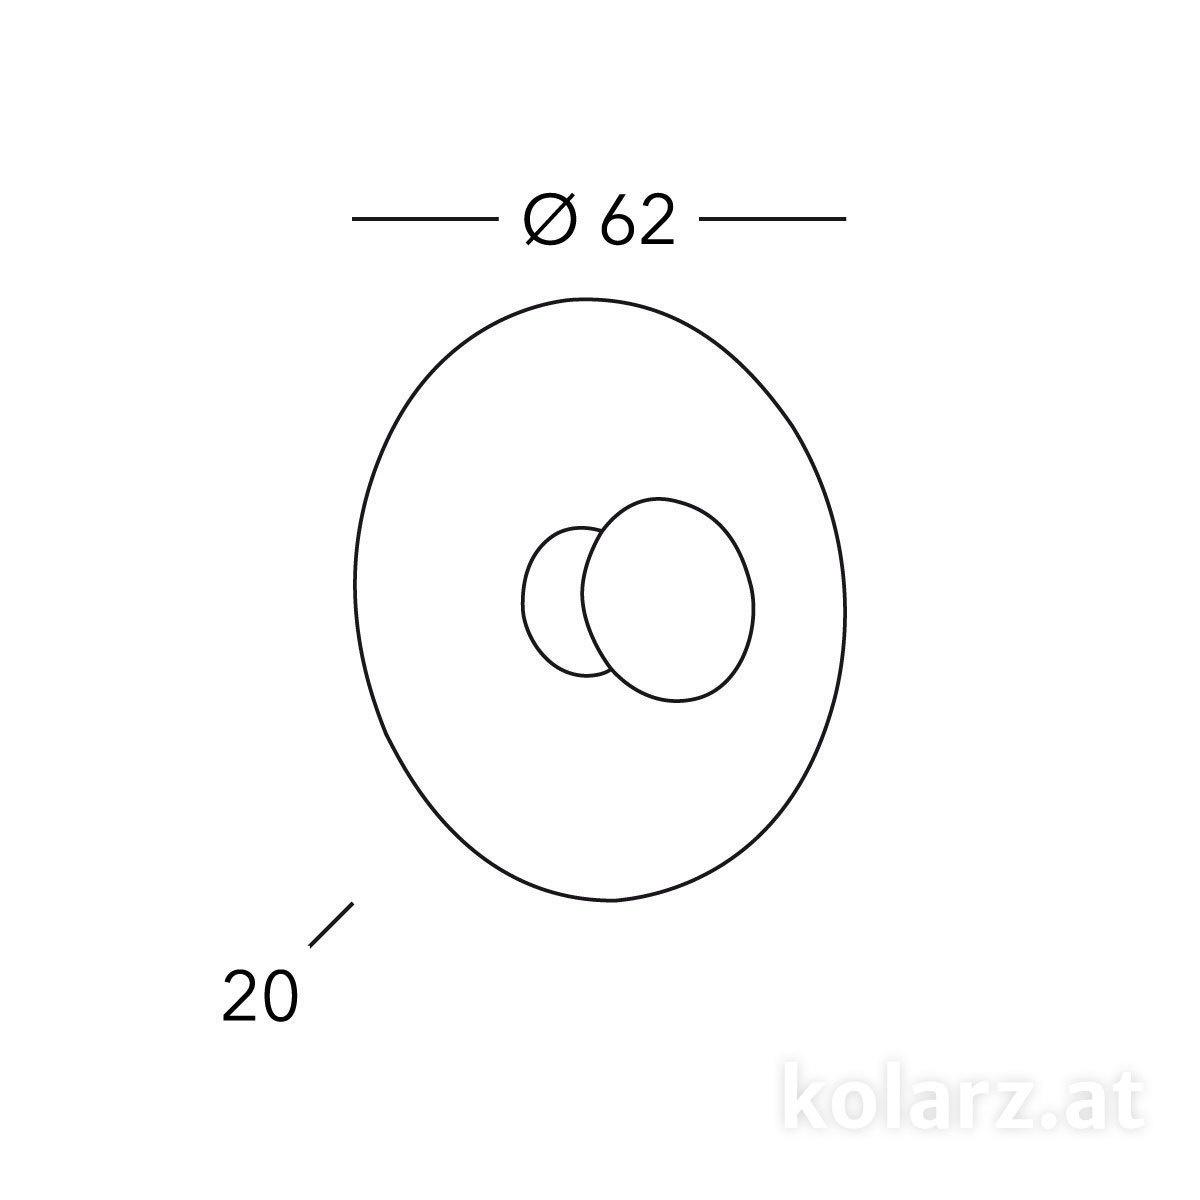 0423-61XL-V1-5-WA-s1.jpg